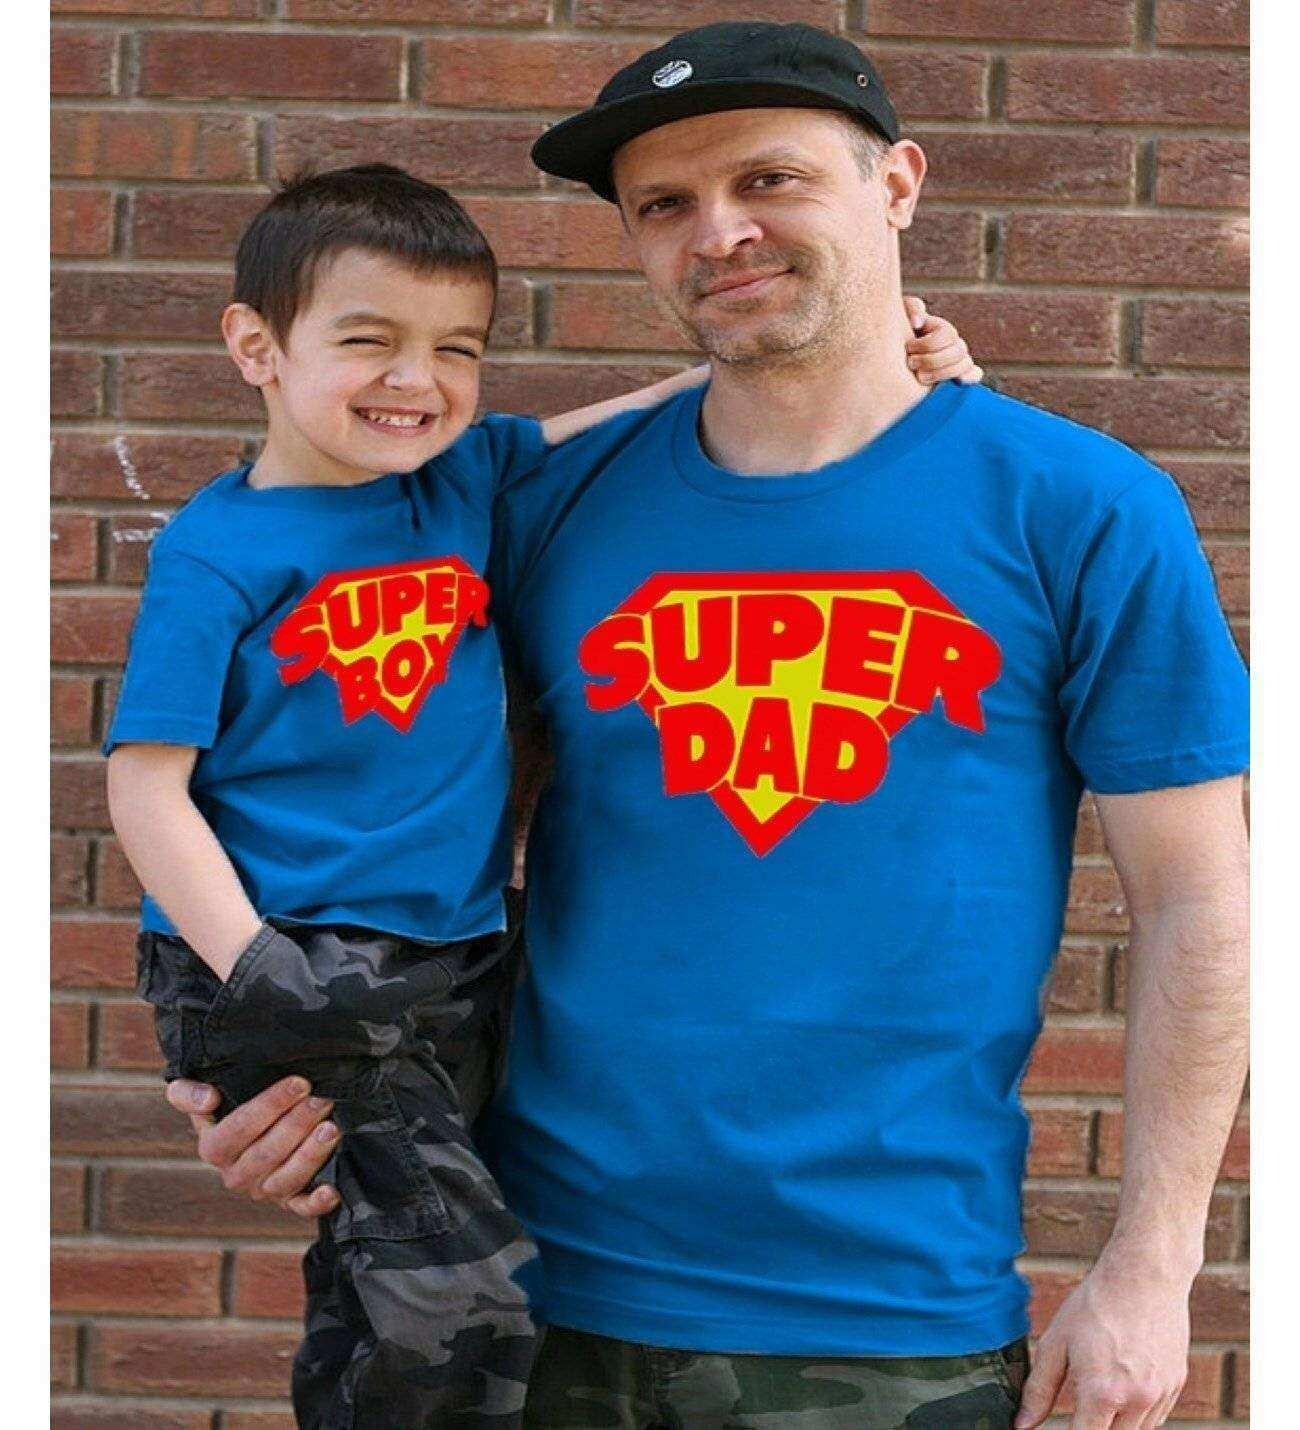 Tshirthane - Süper Dad, Süper Boy Baba Oğul Tshirt Mavi Tişört